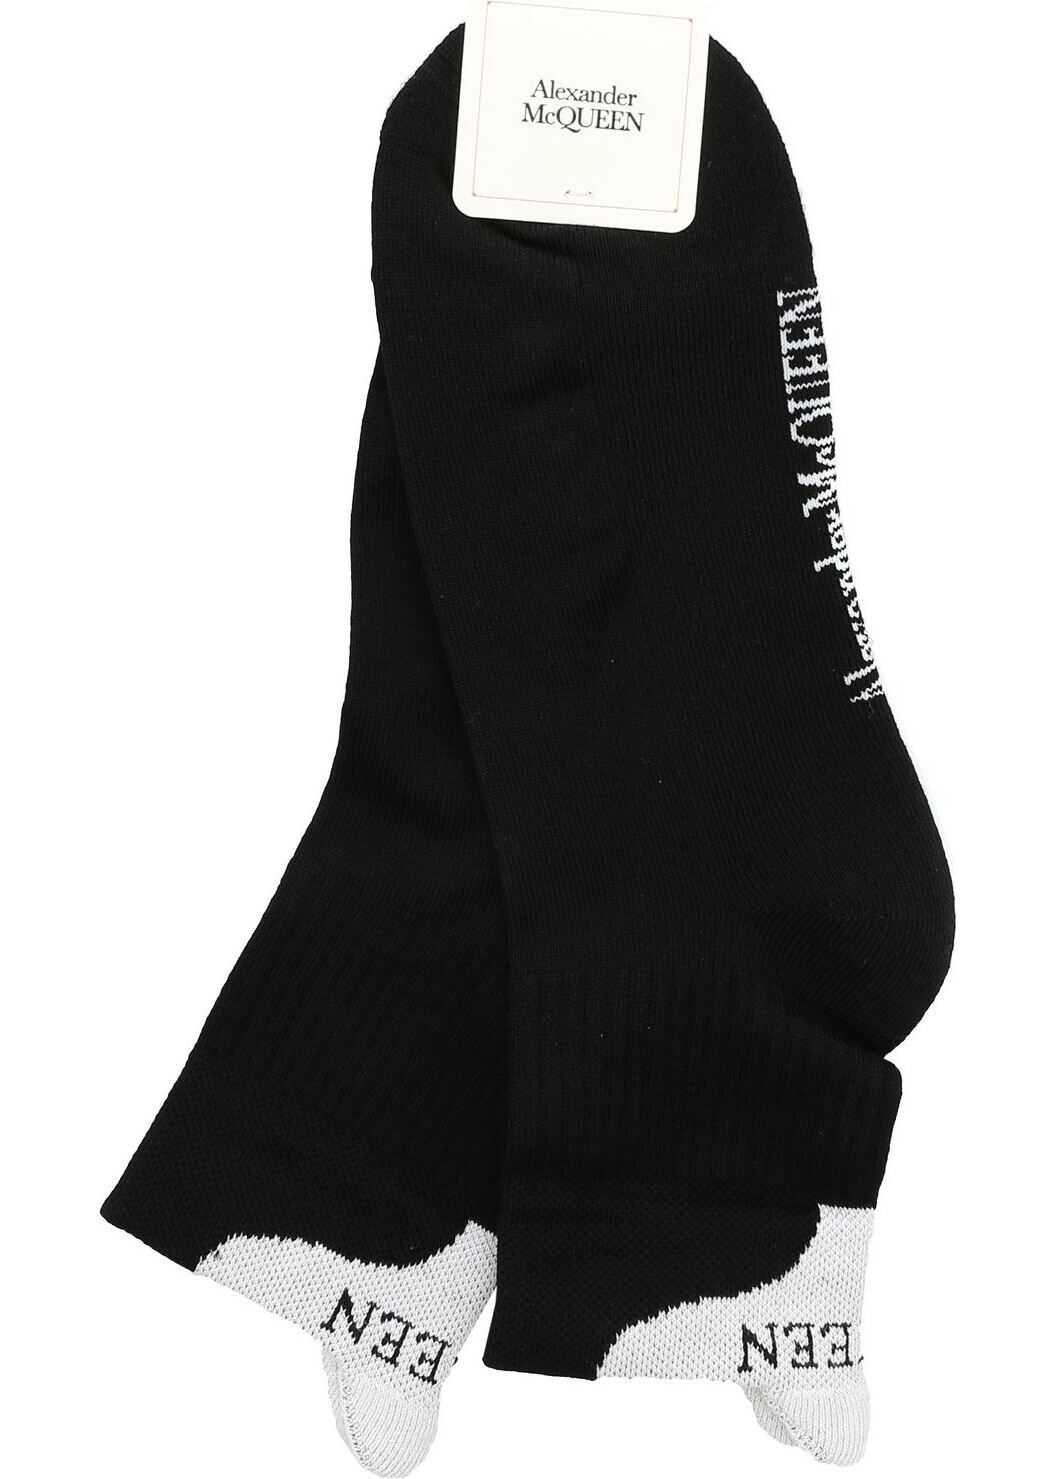 Black And White Socks thumbnail